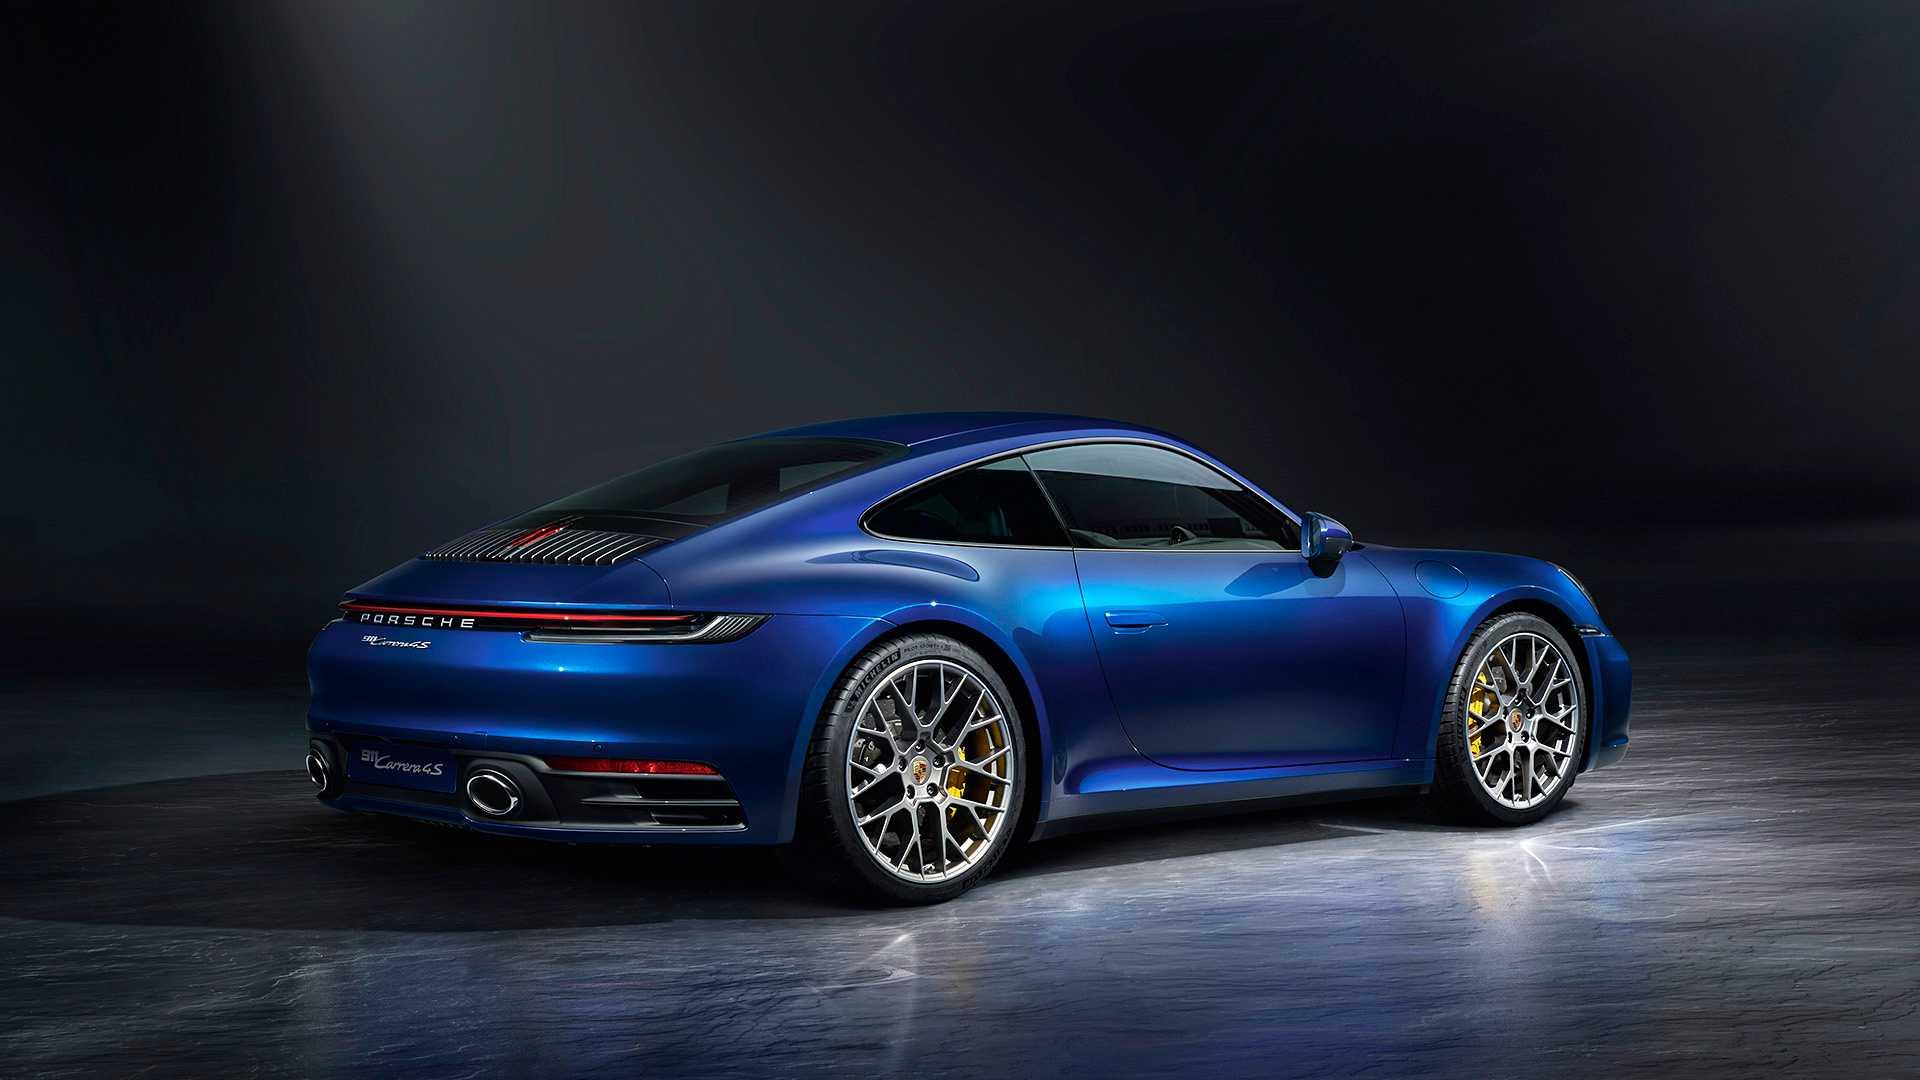 2019-Porsche-911-Carrera-4S-992_8